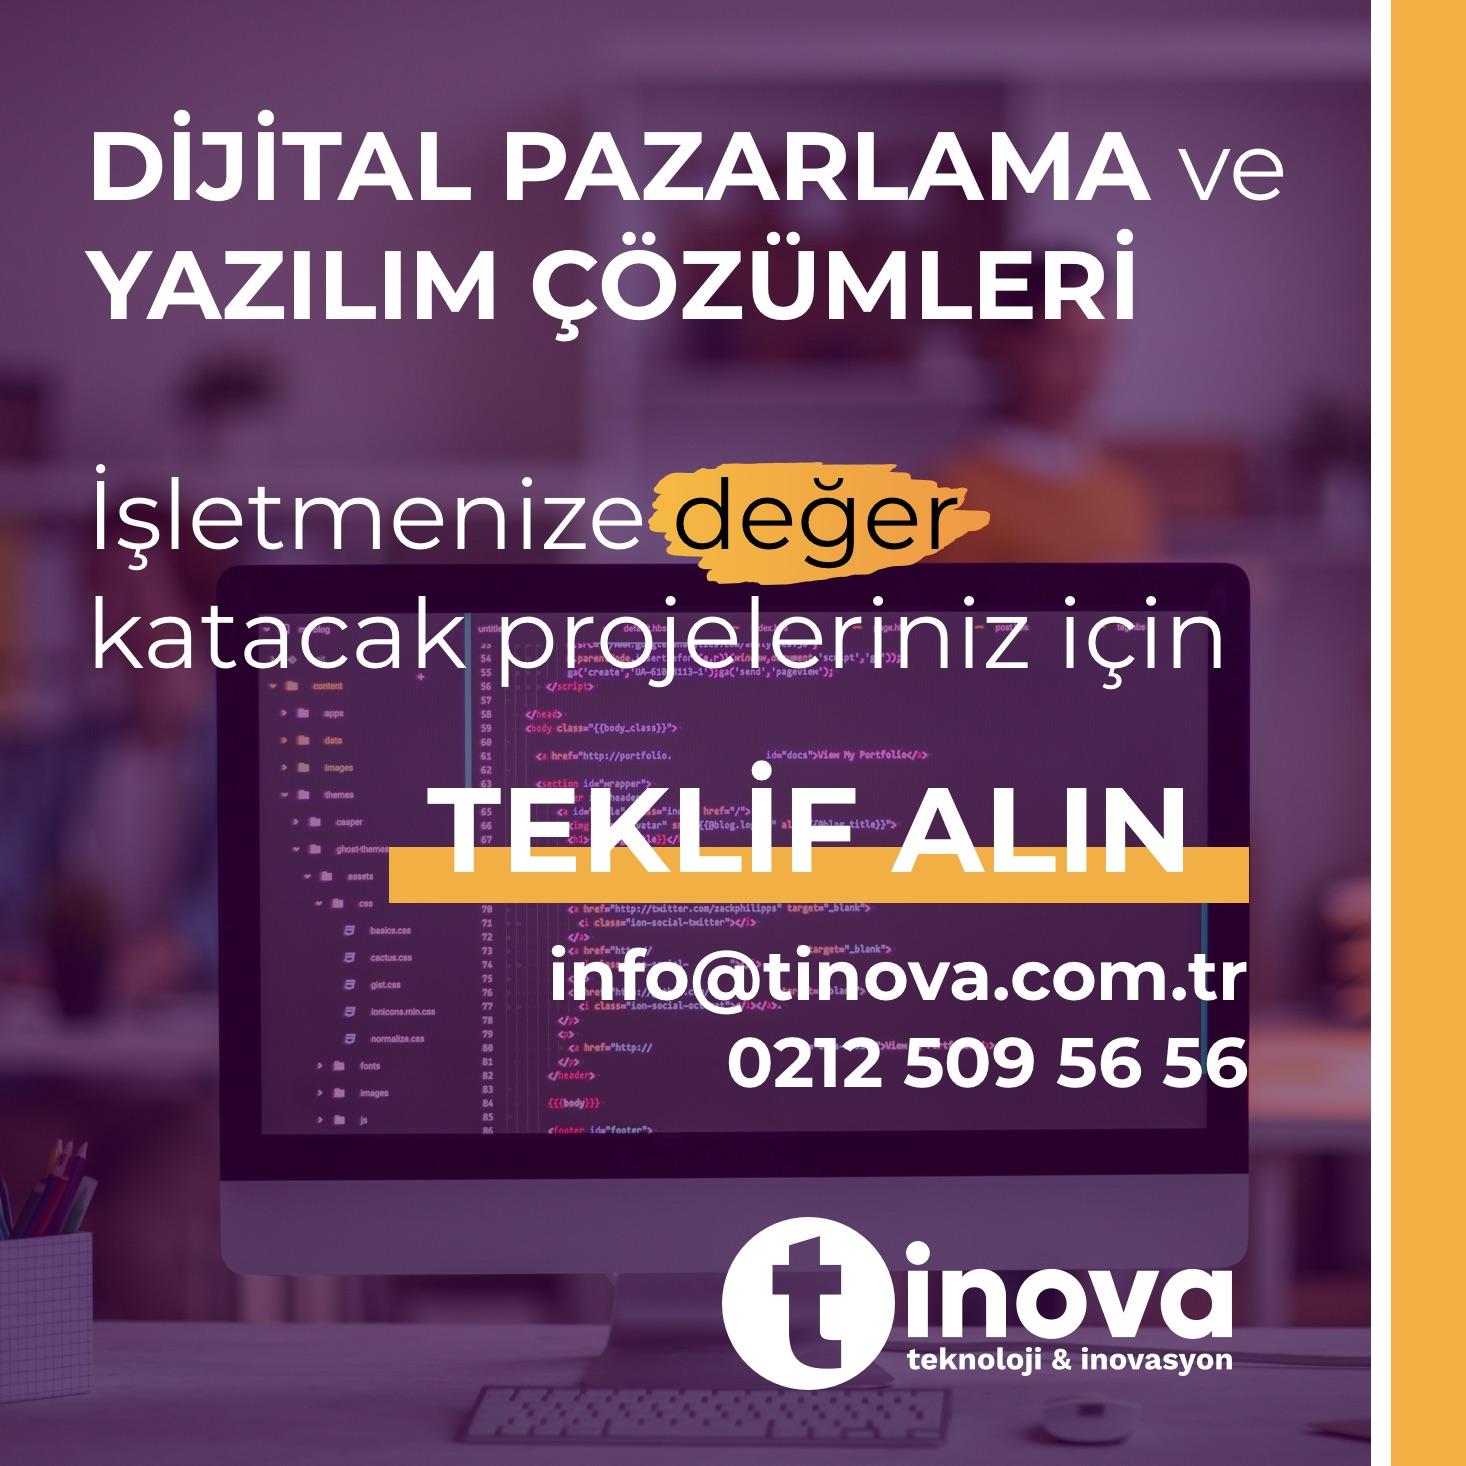 https://tedarikzinciri.org/wp-content/uploads/2020/03/tinova_yazilim_cozumleri.jpg